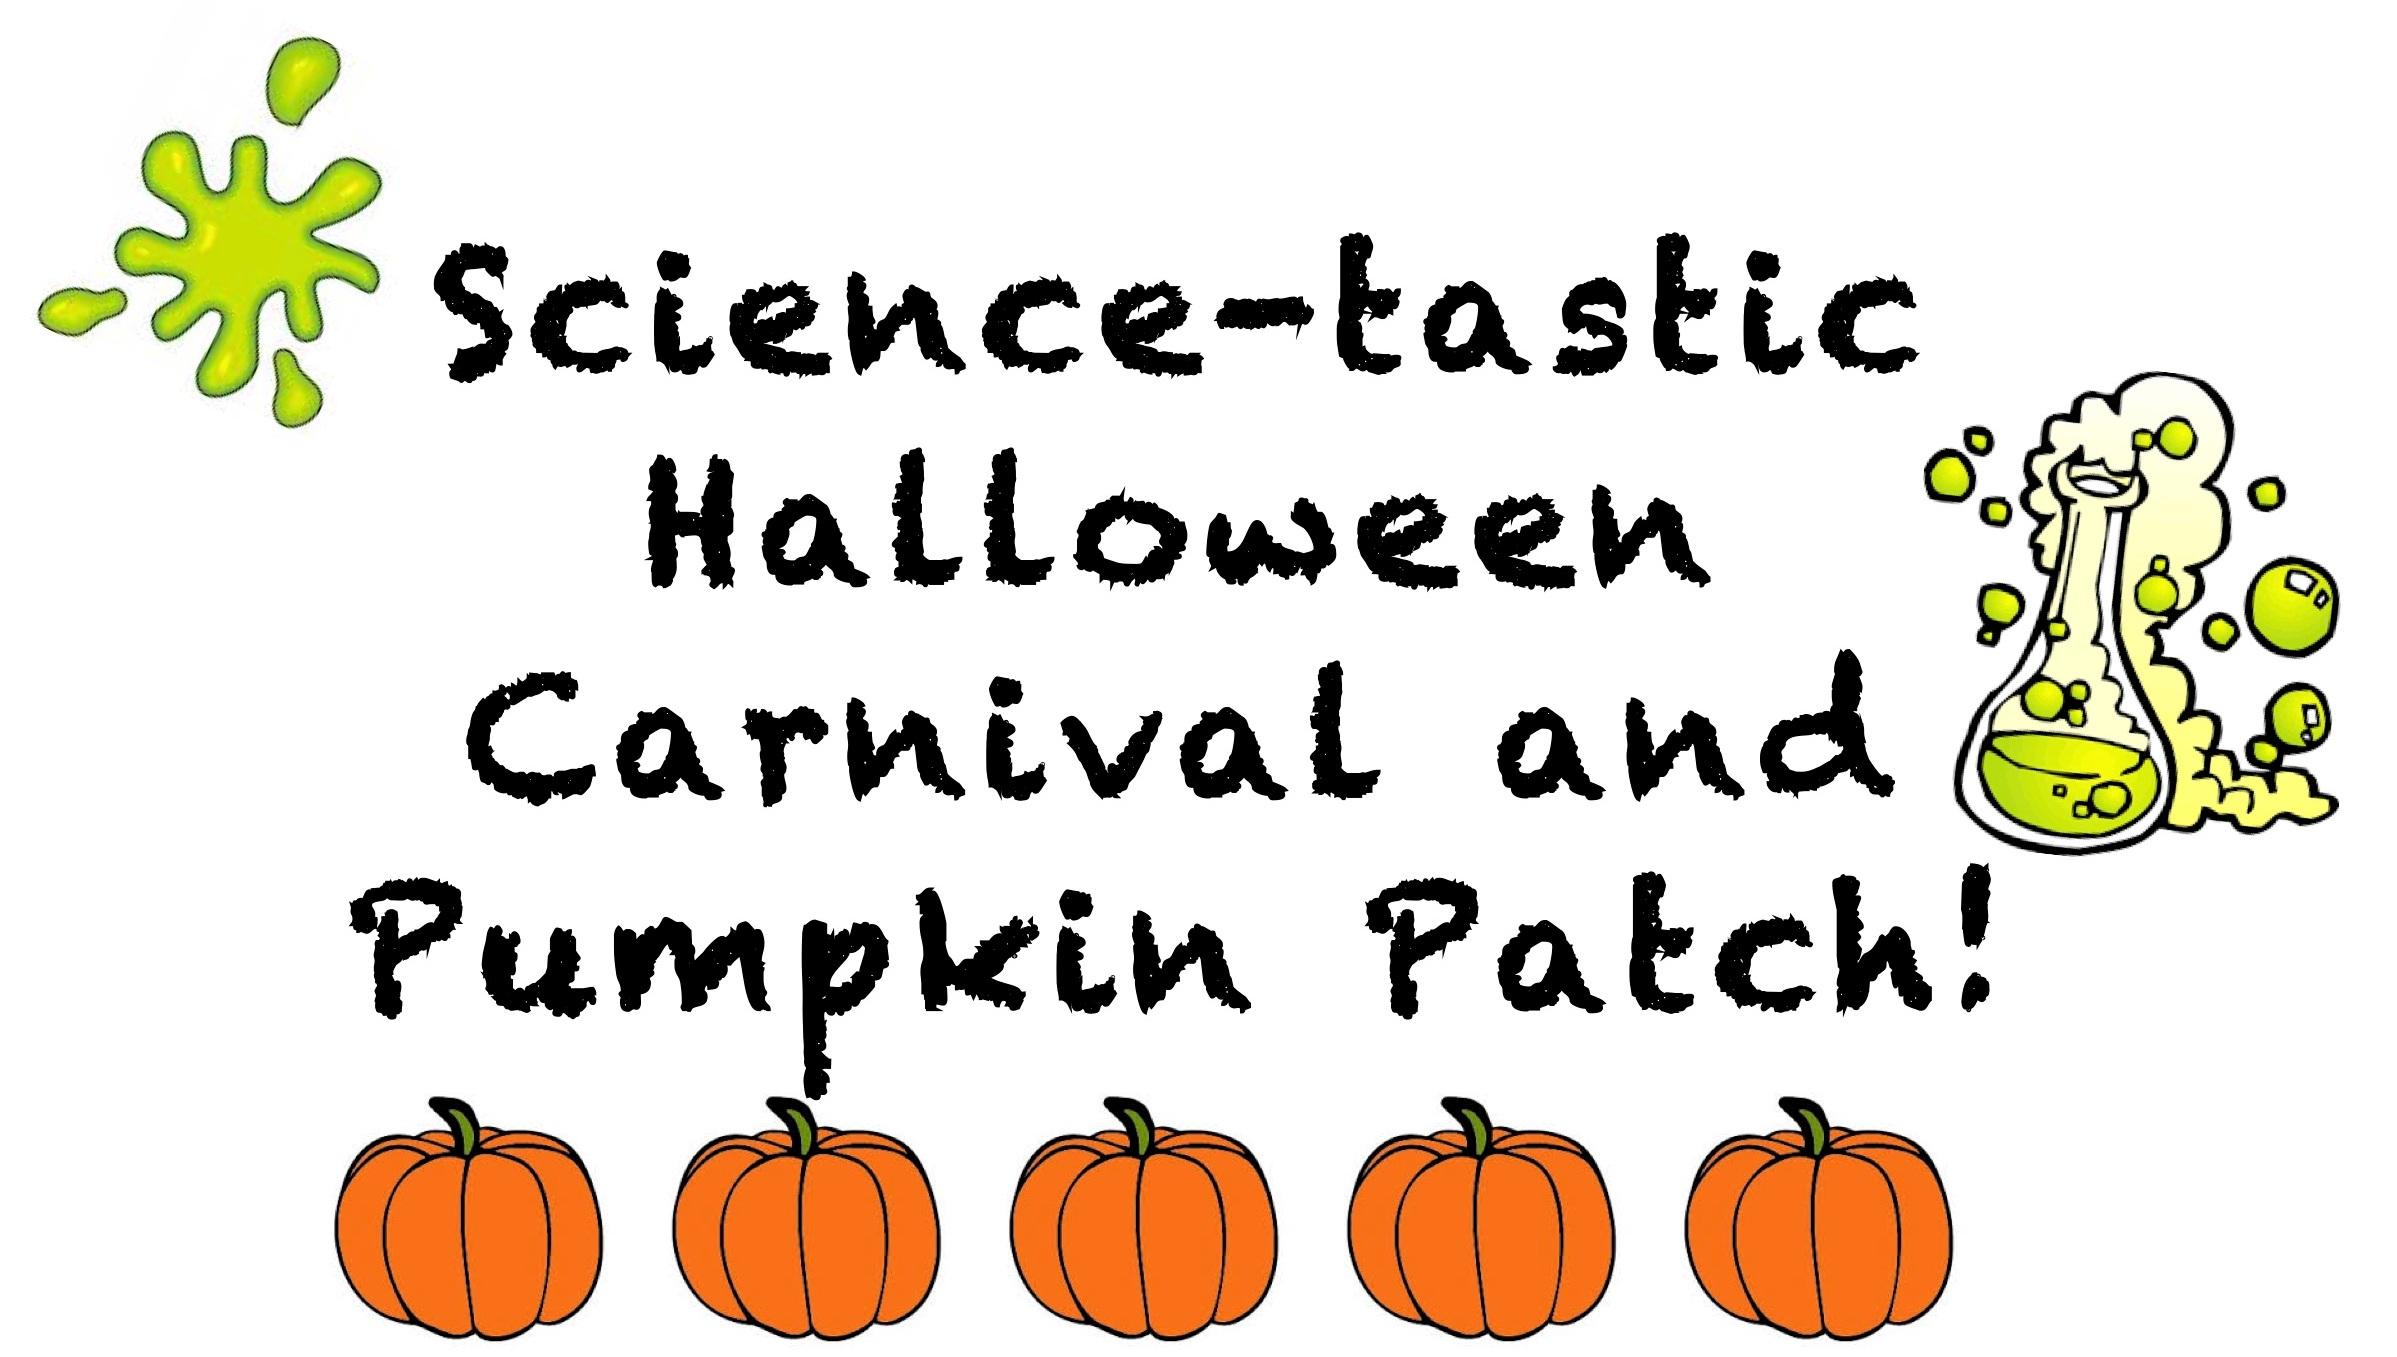 Science-tastic+Halloween+Carnival+poster+2019+v2.jpg